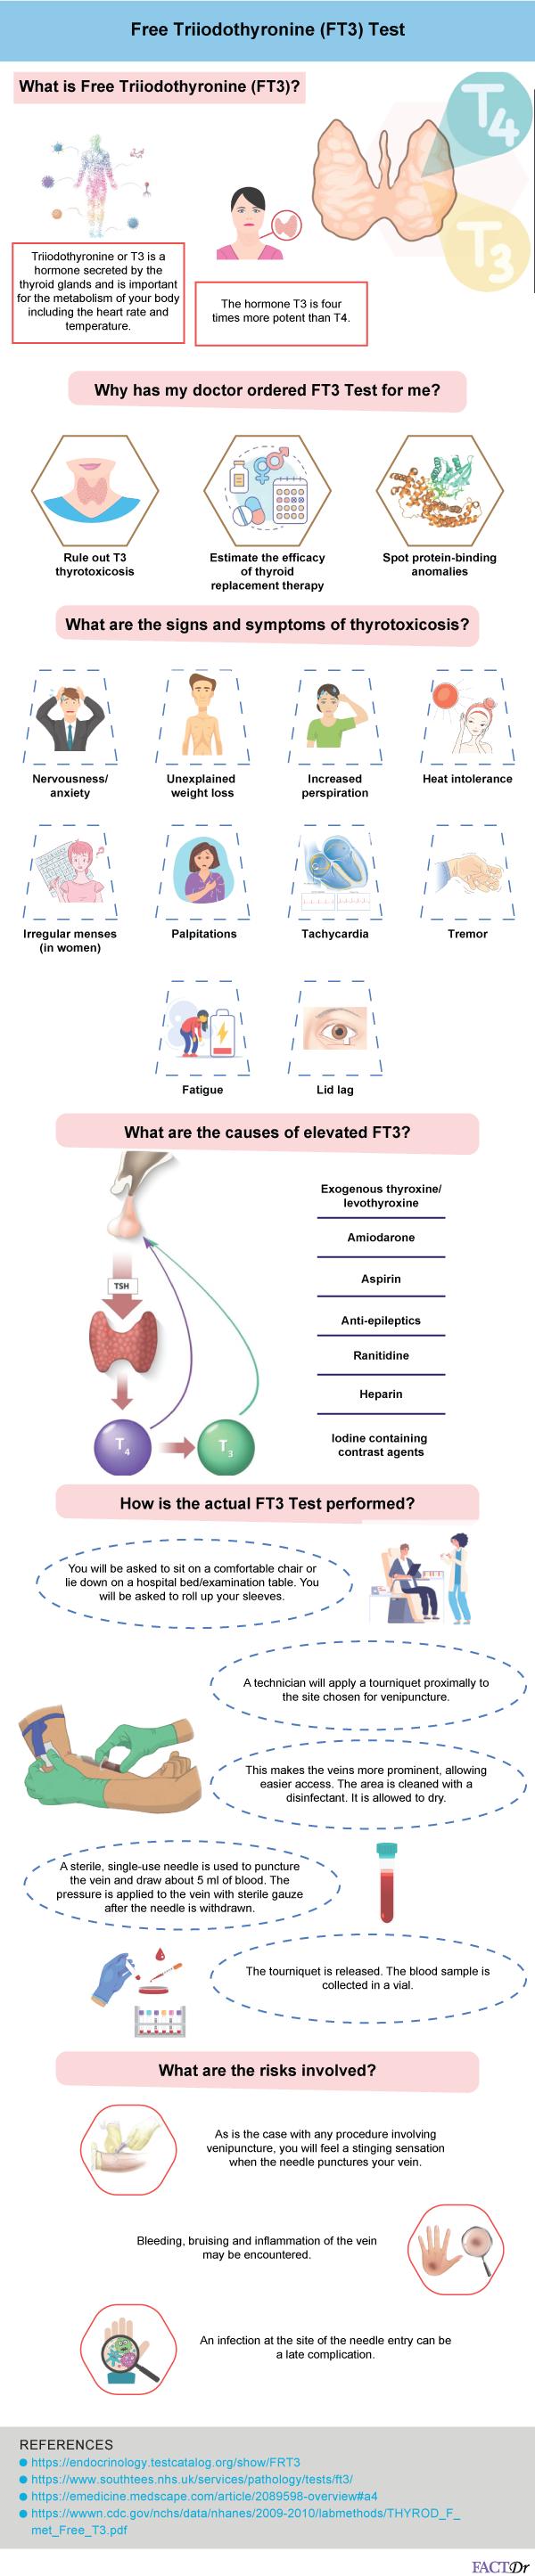 free triiodothyronine or FT3 test